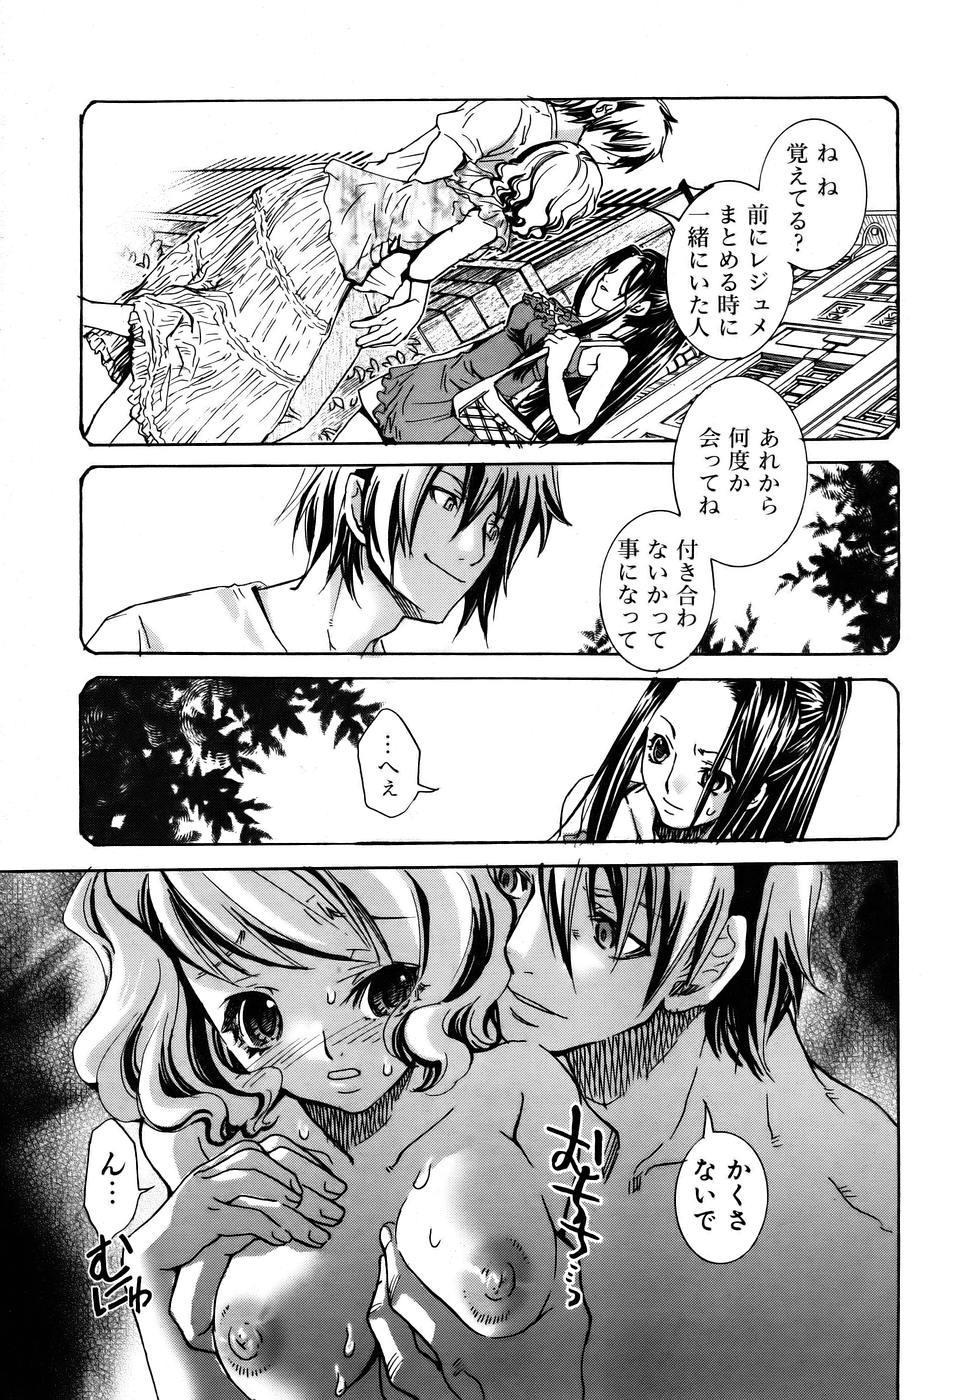 COMIC AUN 2005-12 Vol. 115 142